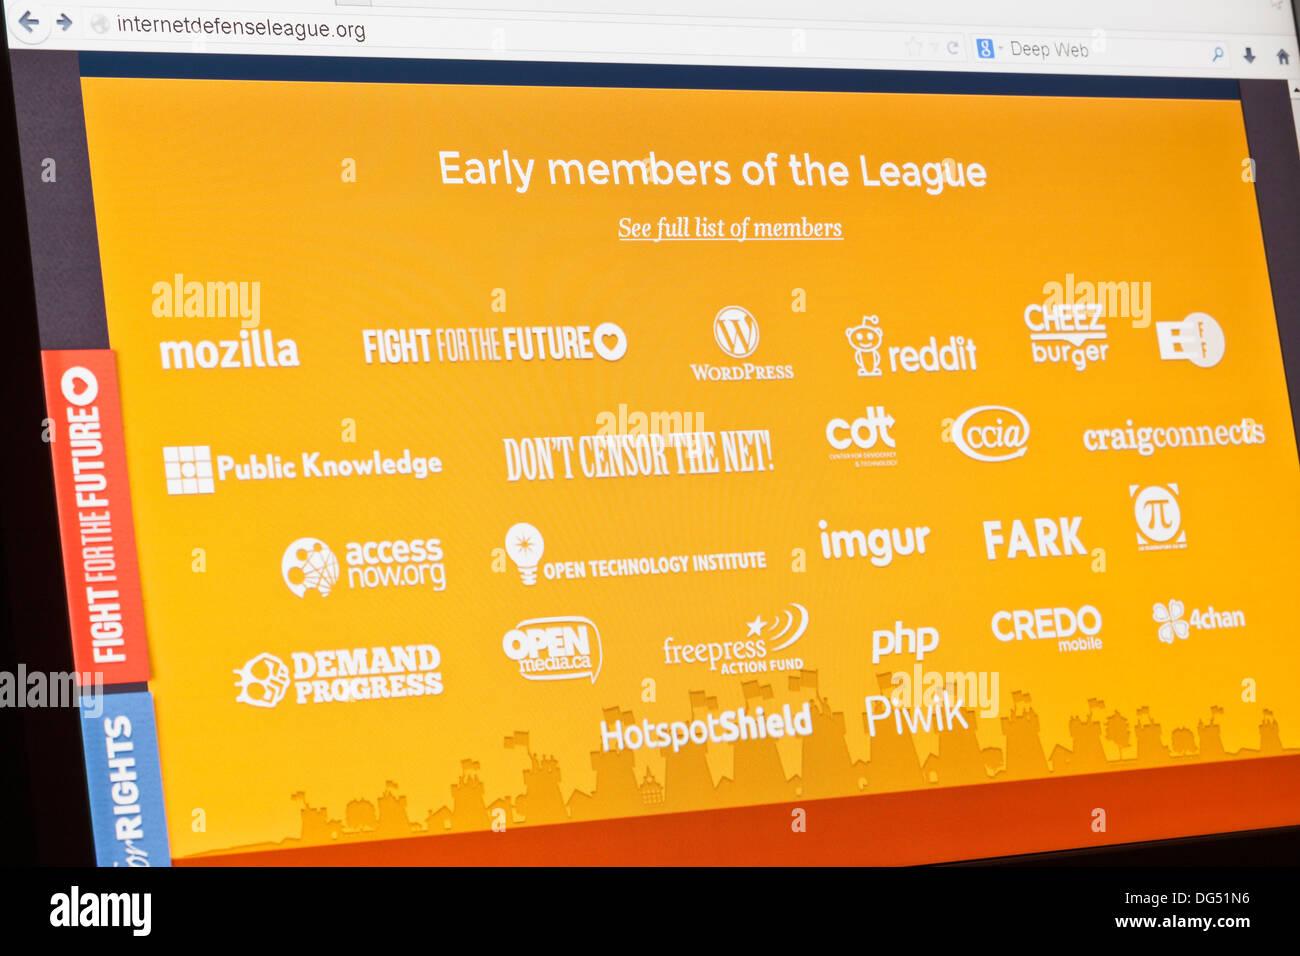 Captura de pantalla de la liga de defensa de internet homepage Imagen De Stock